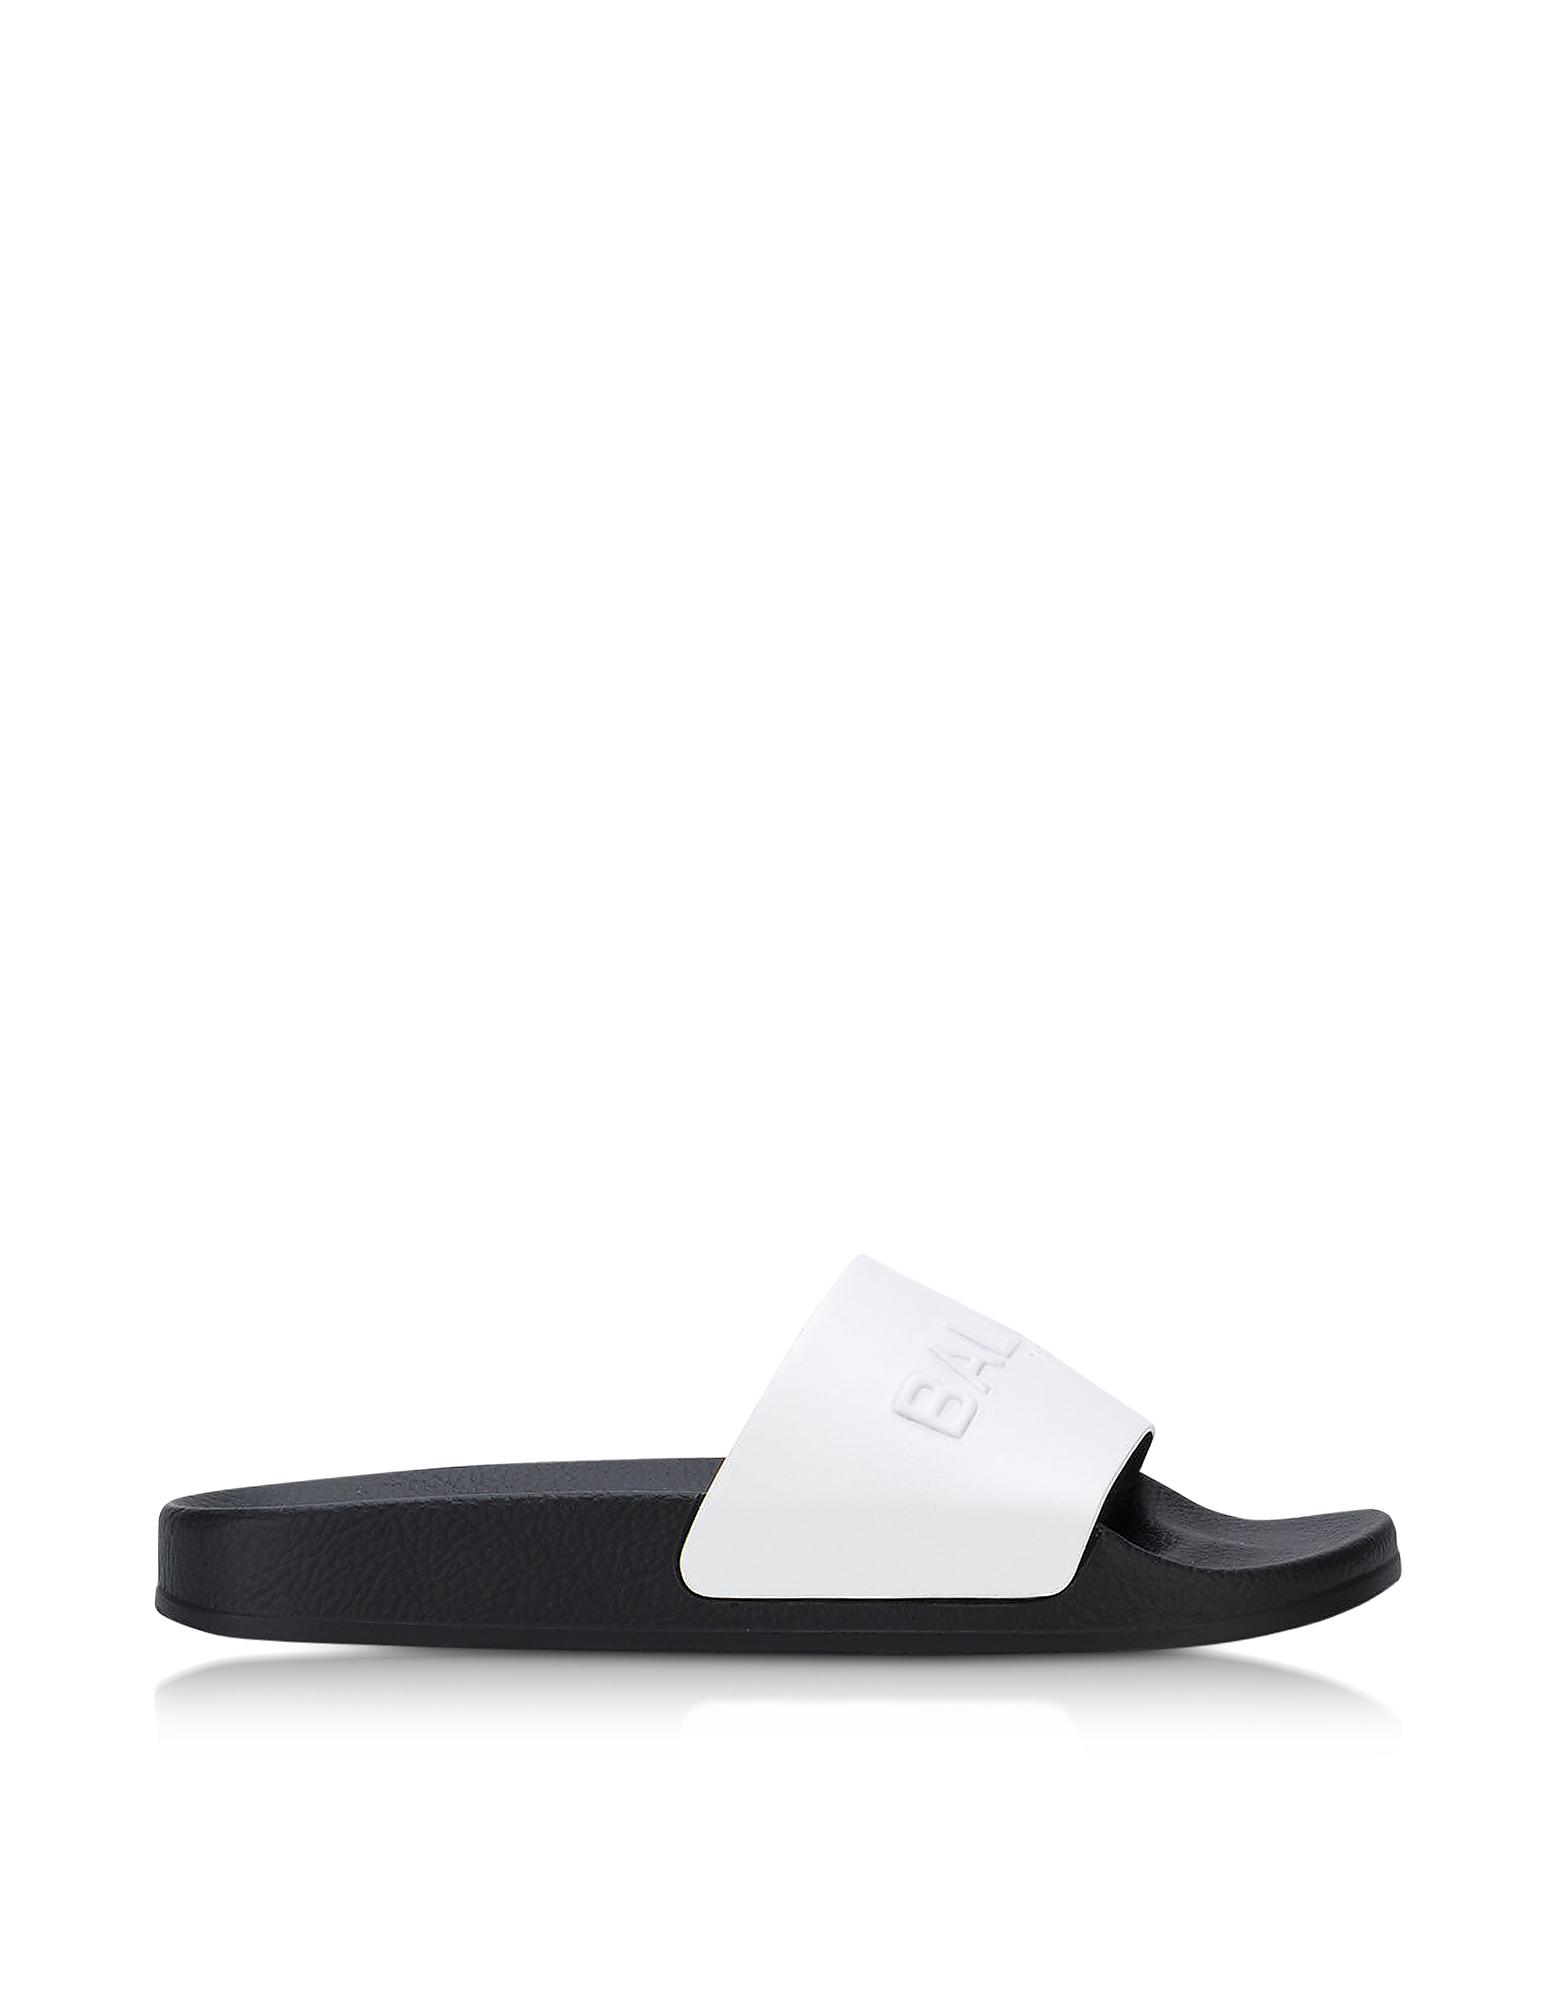 Balmain Shoes, White Leather Calypso Women's Slide Sandals